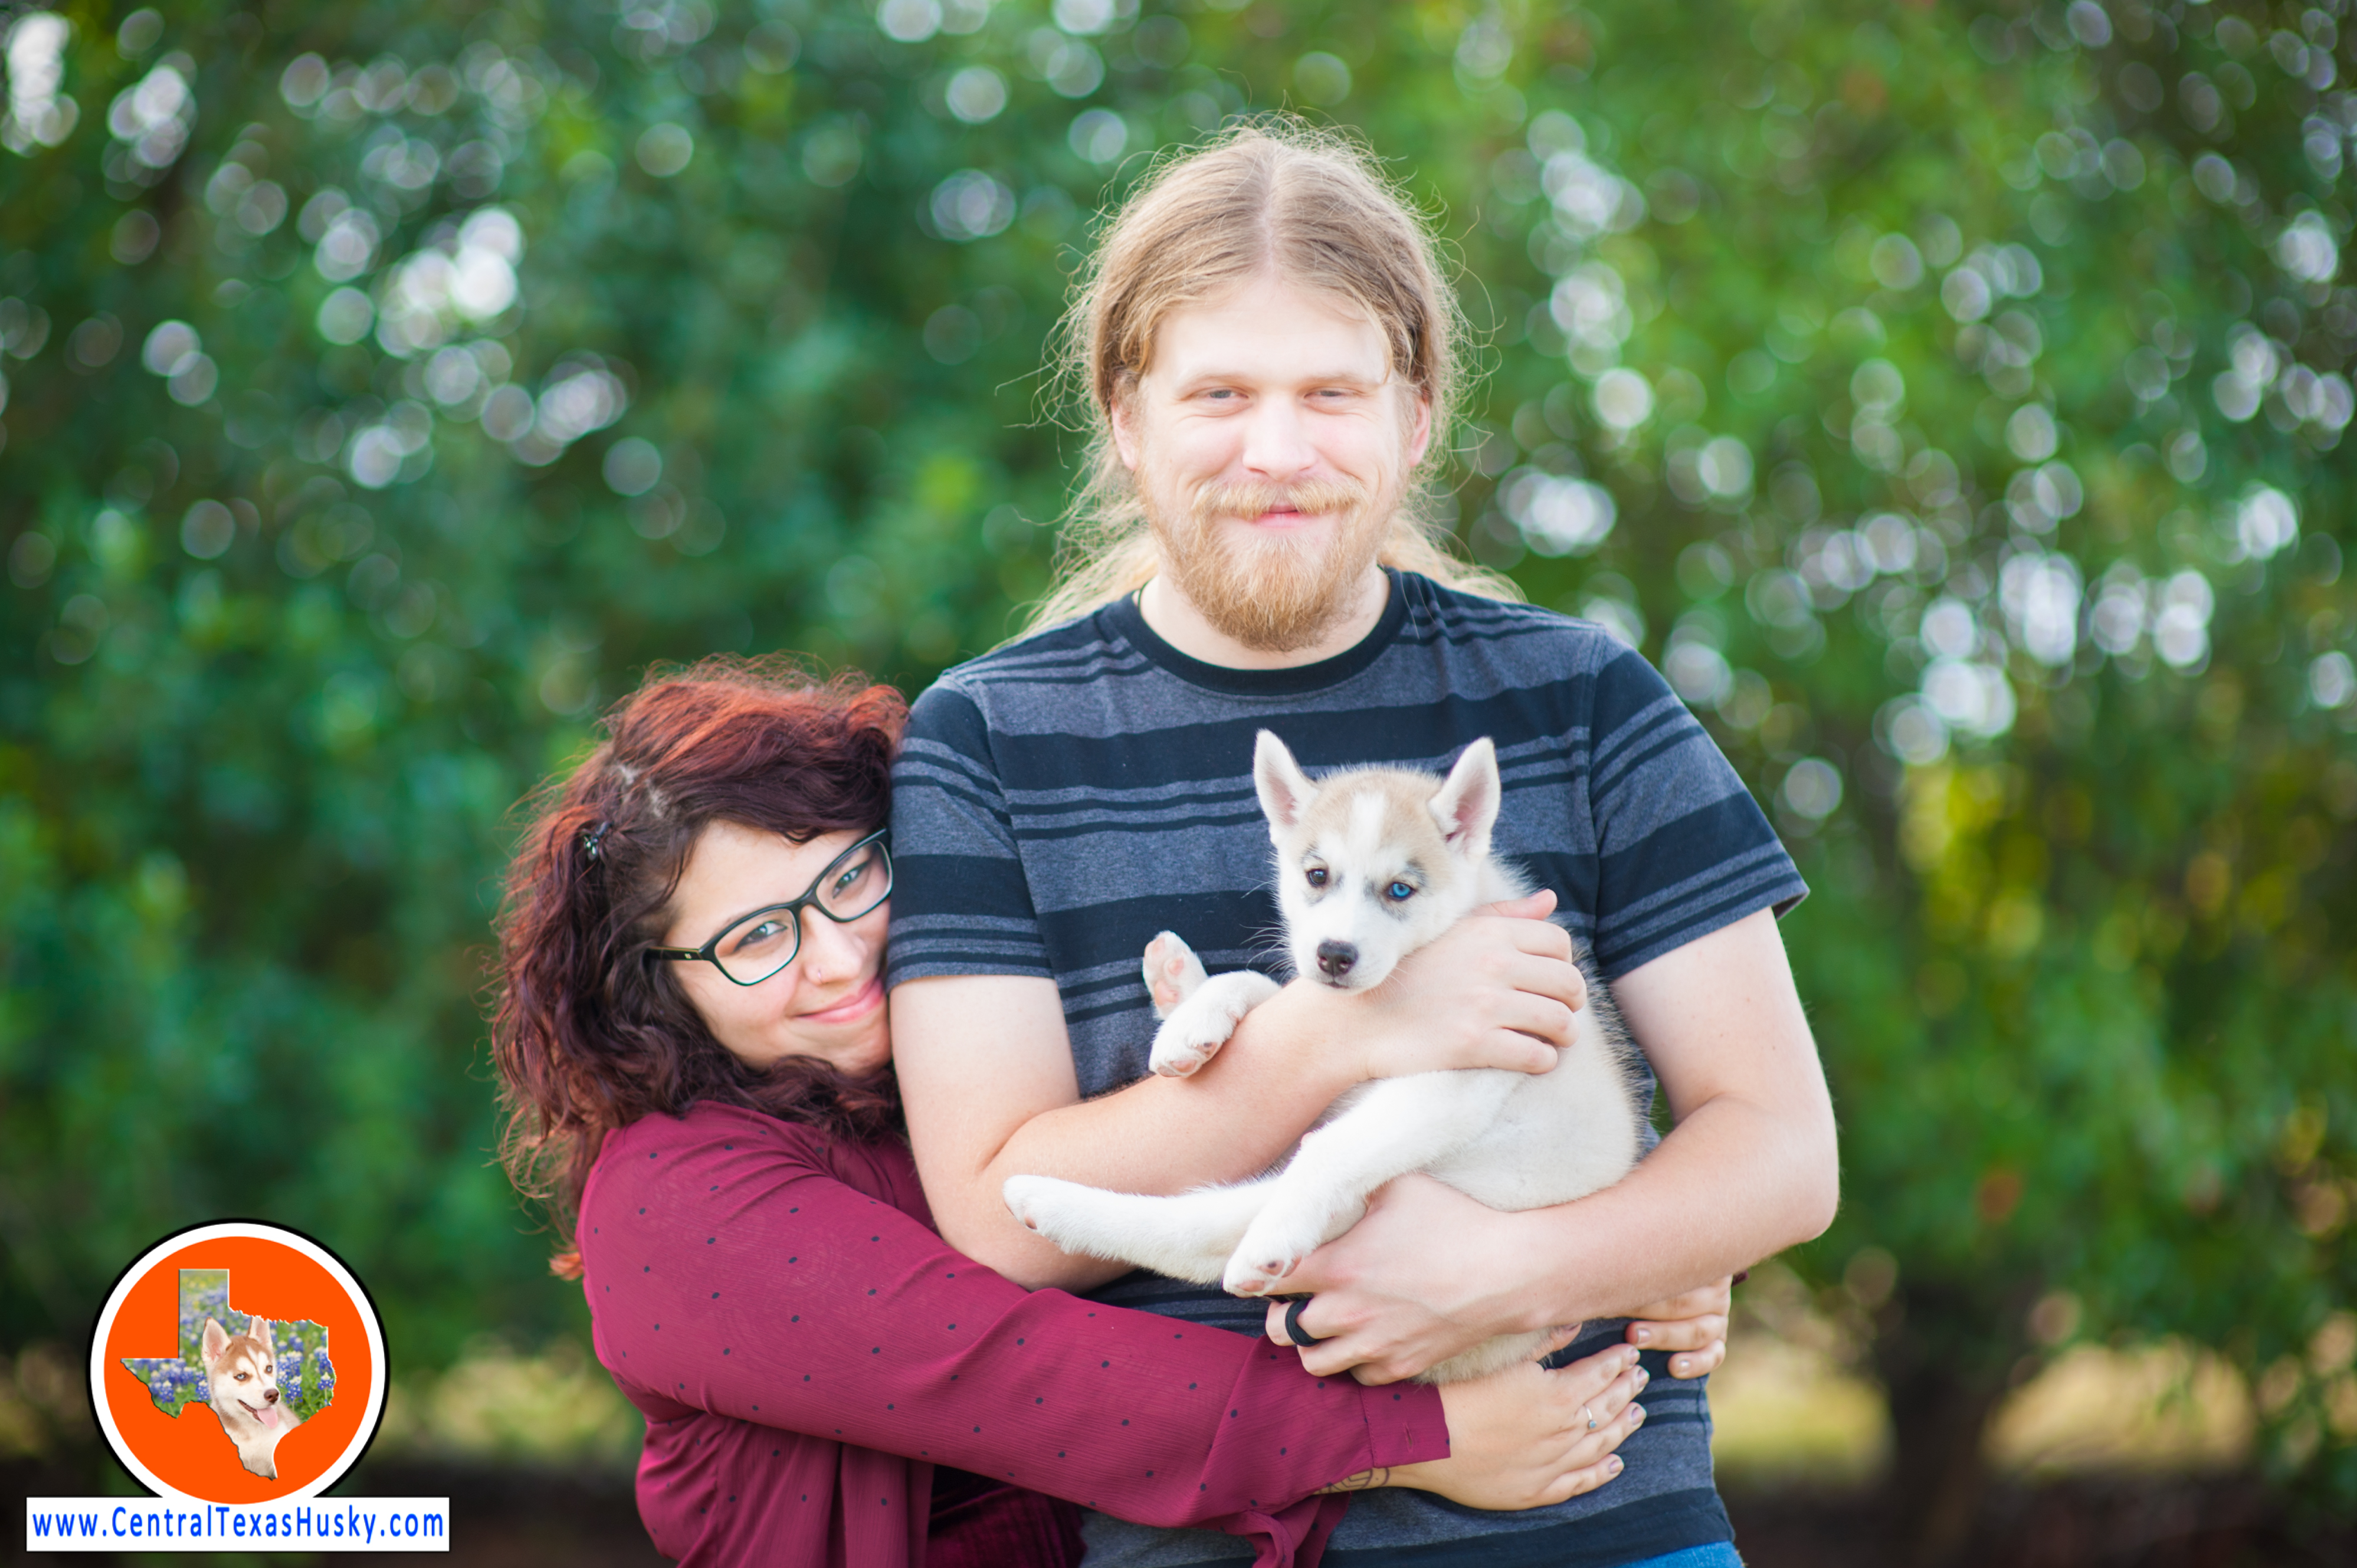 central-texas-husky_austin-siberian-husky-breeder_702542_20171103